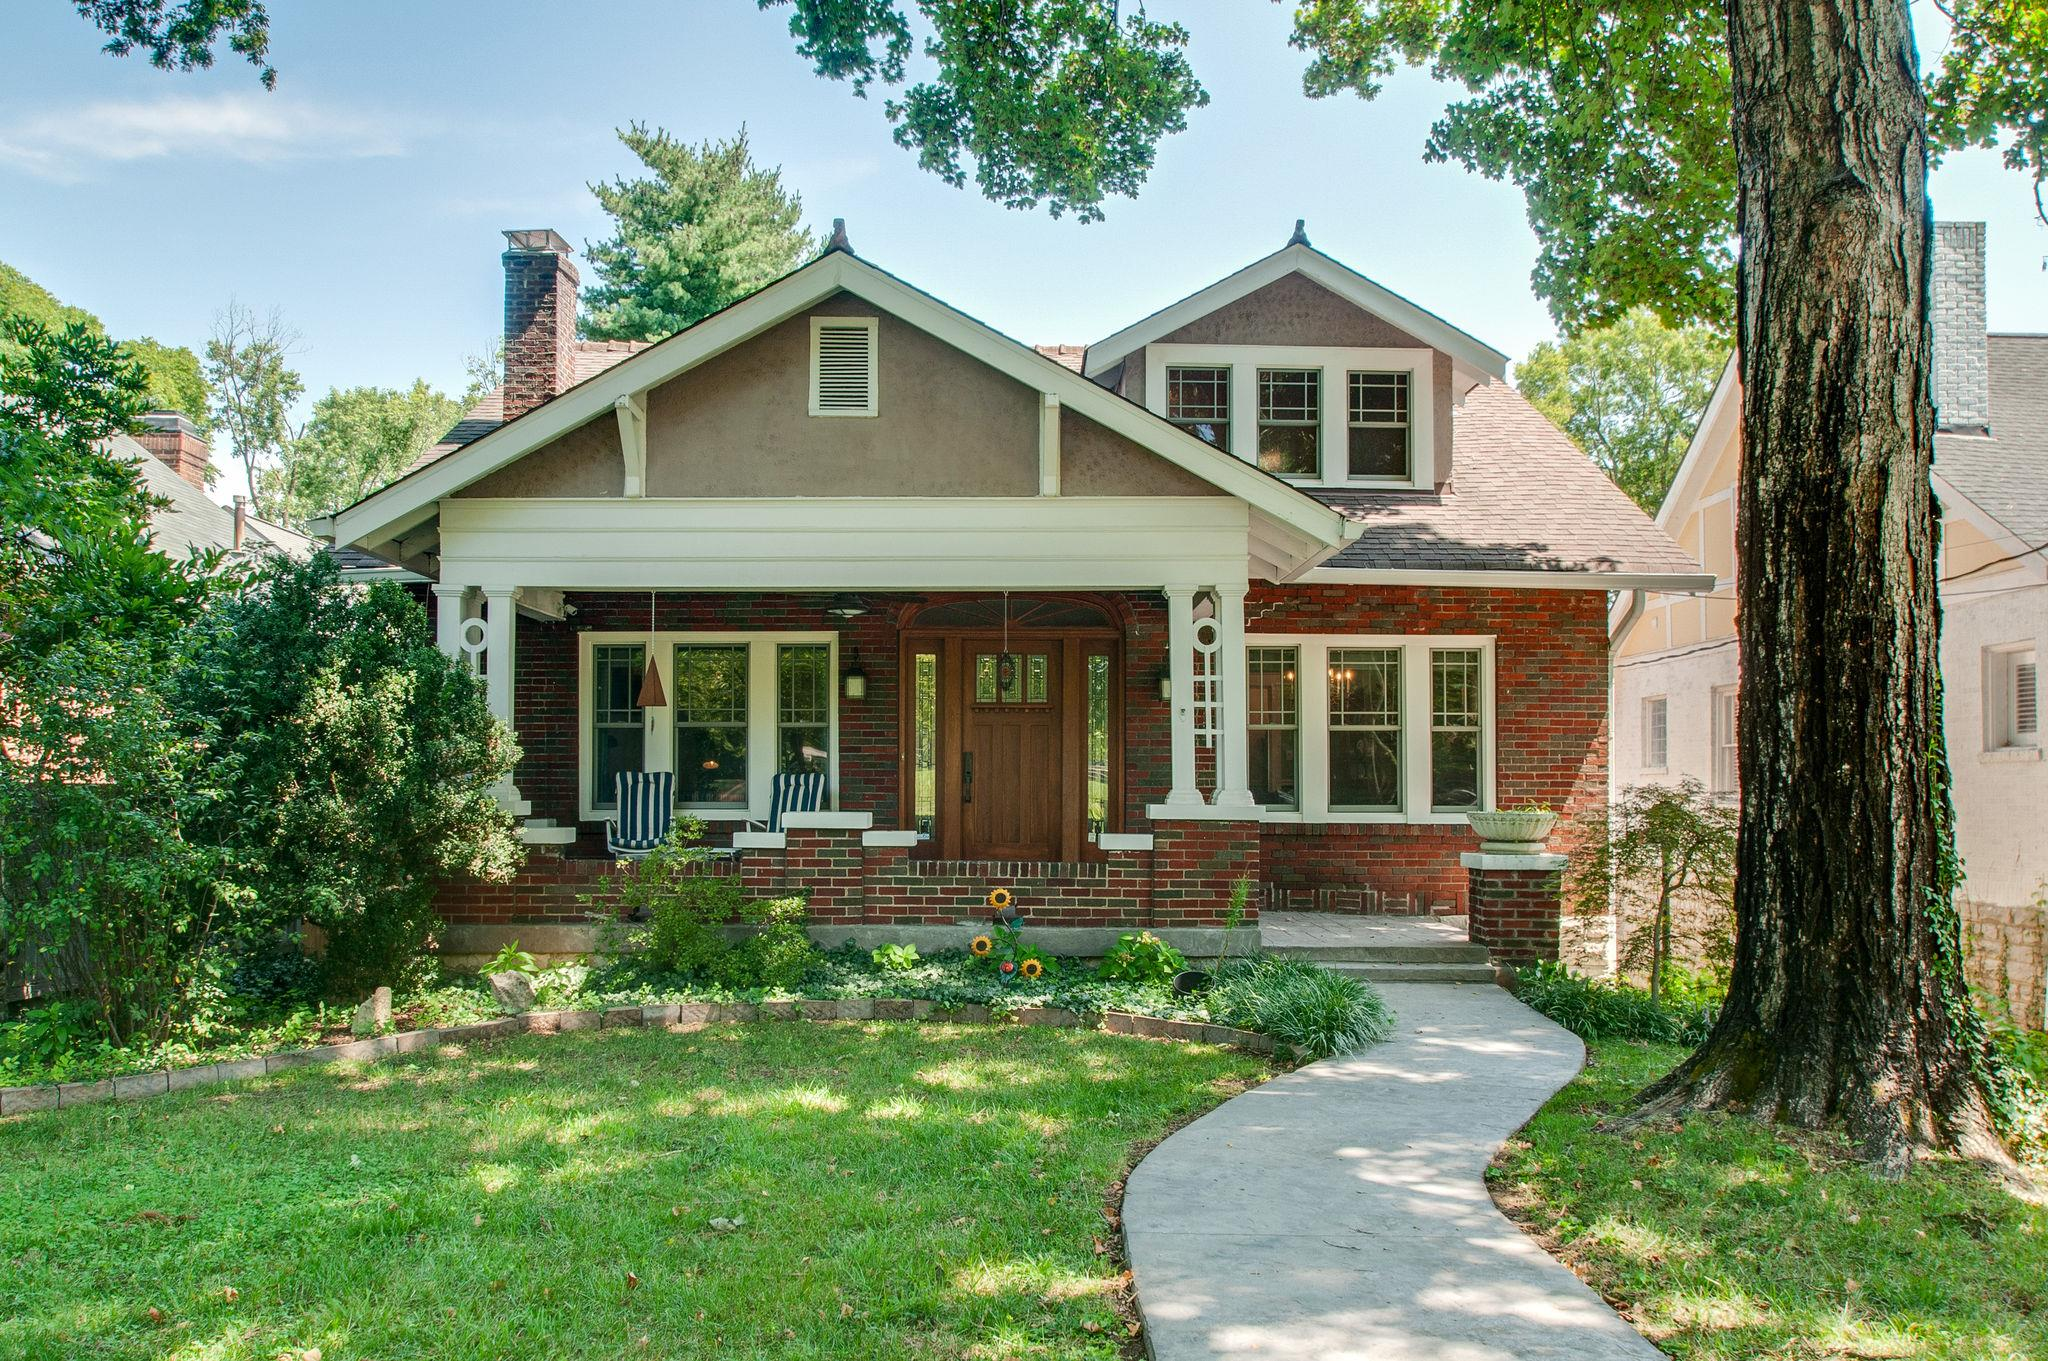 128 Woodmont Blvd, Nashville, TN 37205 - Nashville, TN real estate listing